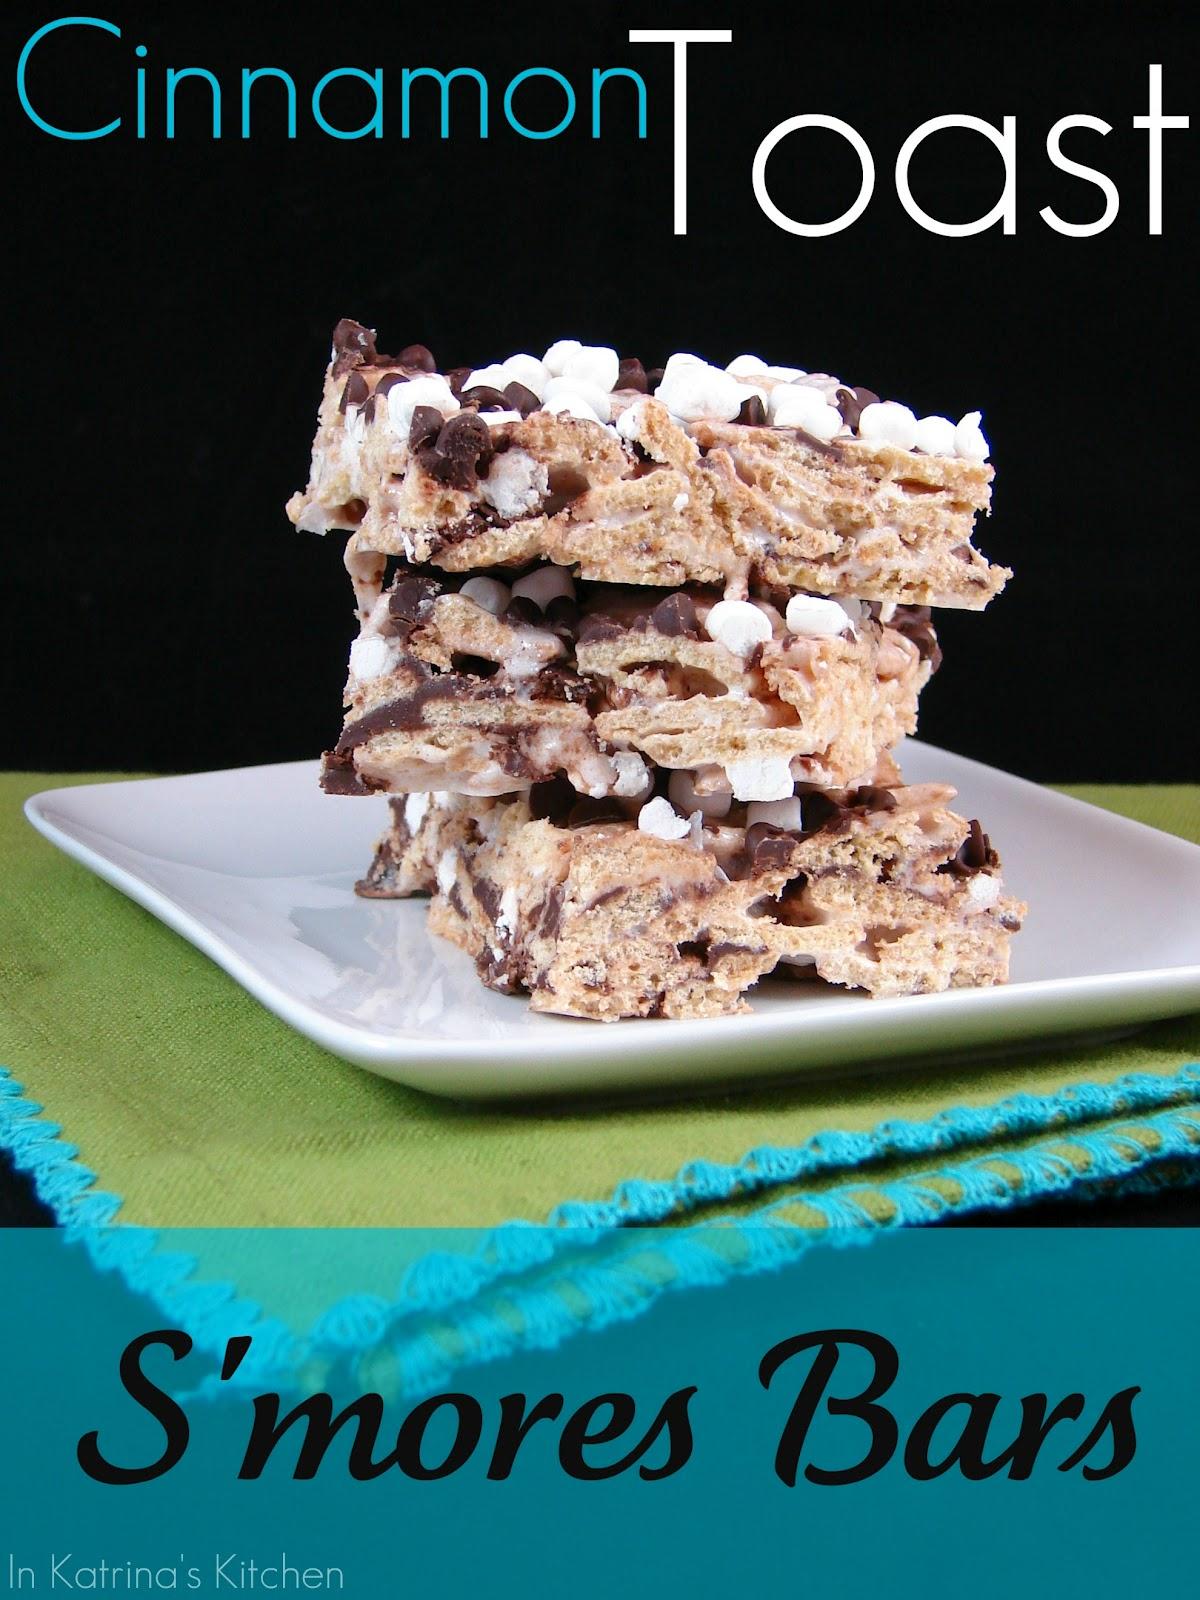 Cinnamon Toast S'mores Bars Recipe